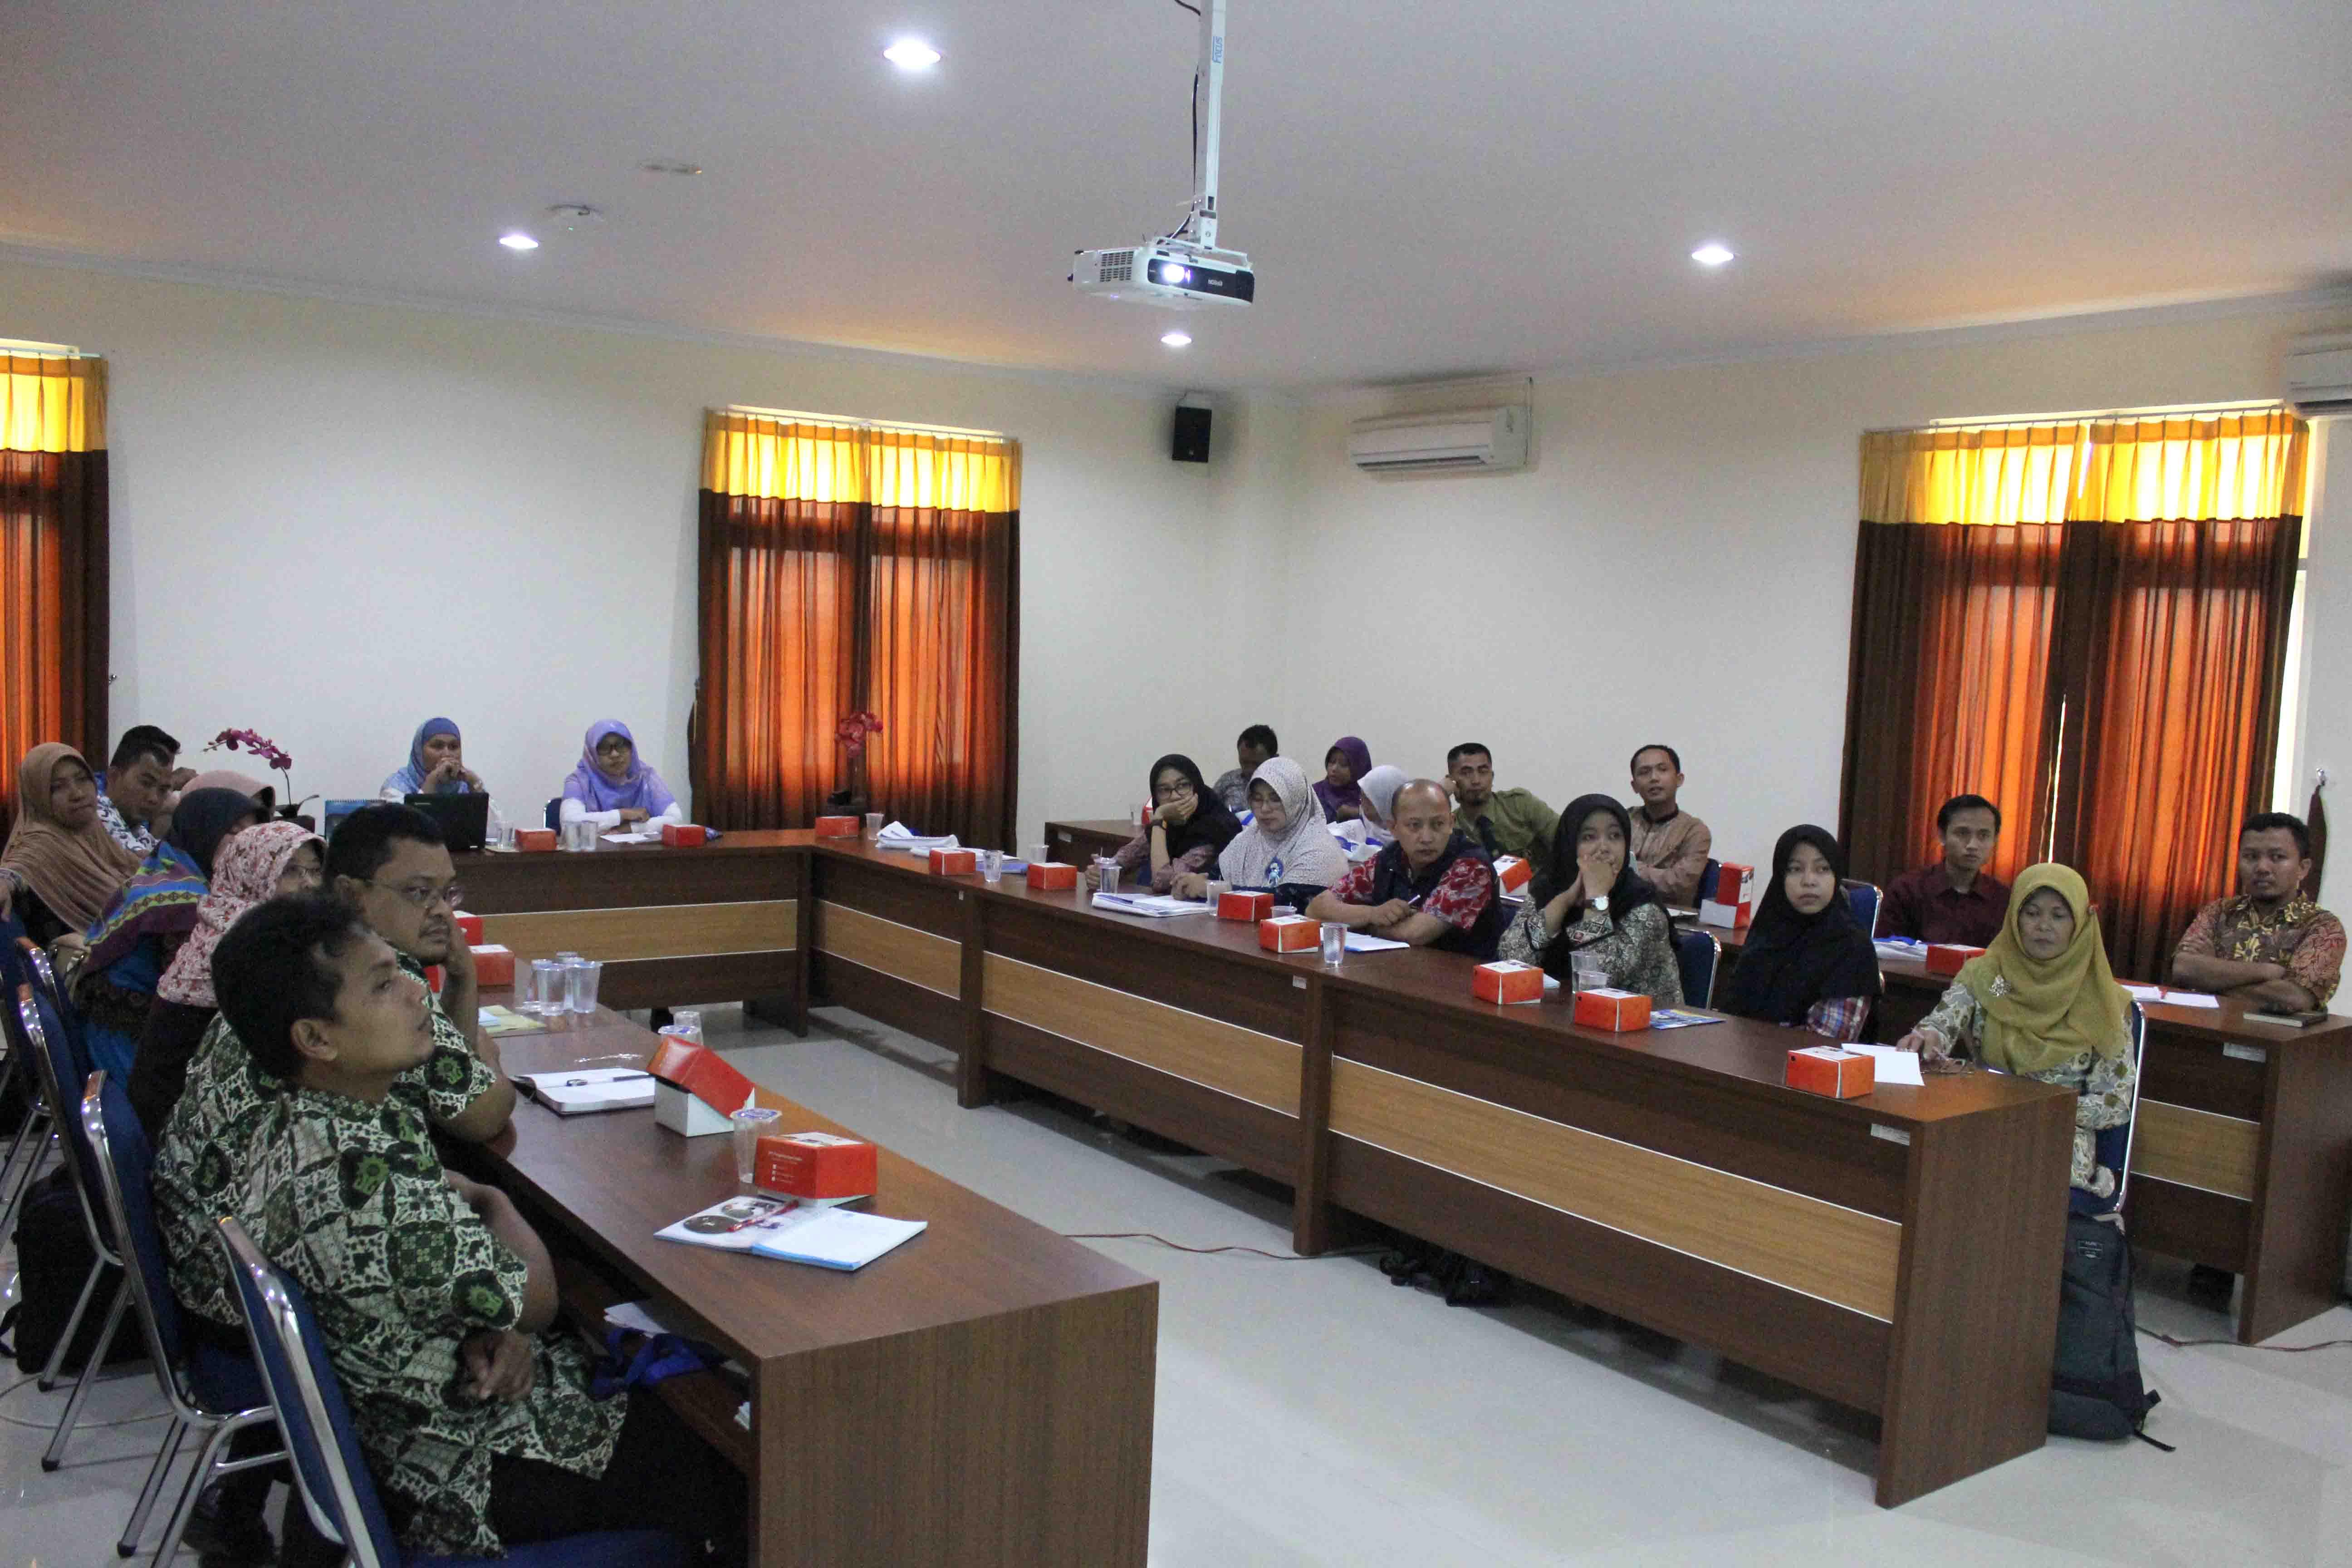 Sesi diskusi peserta